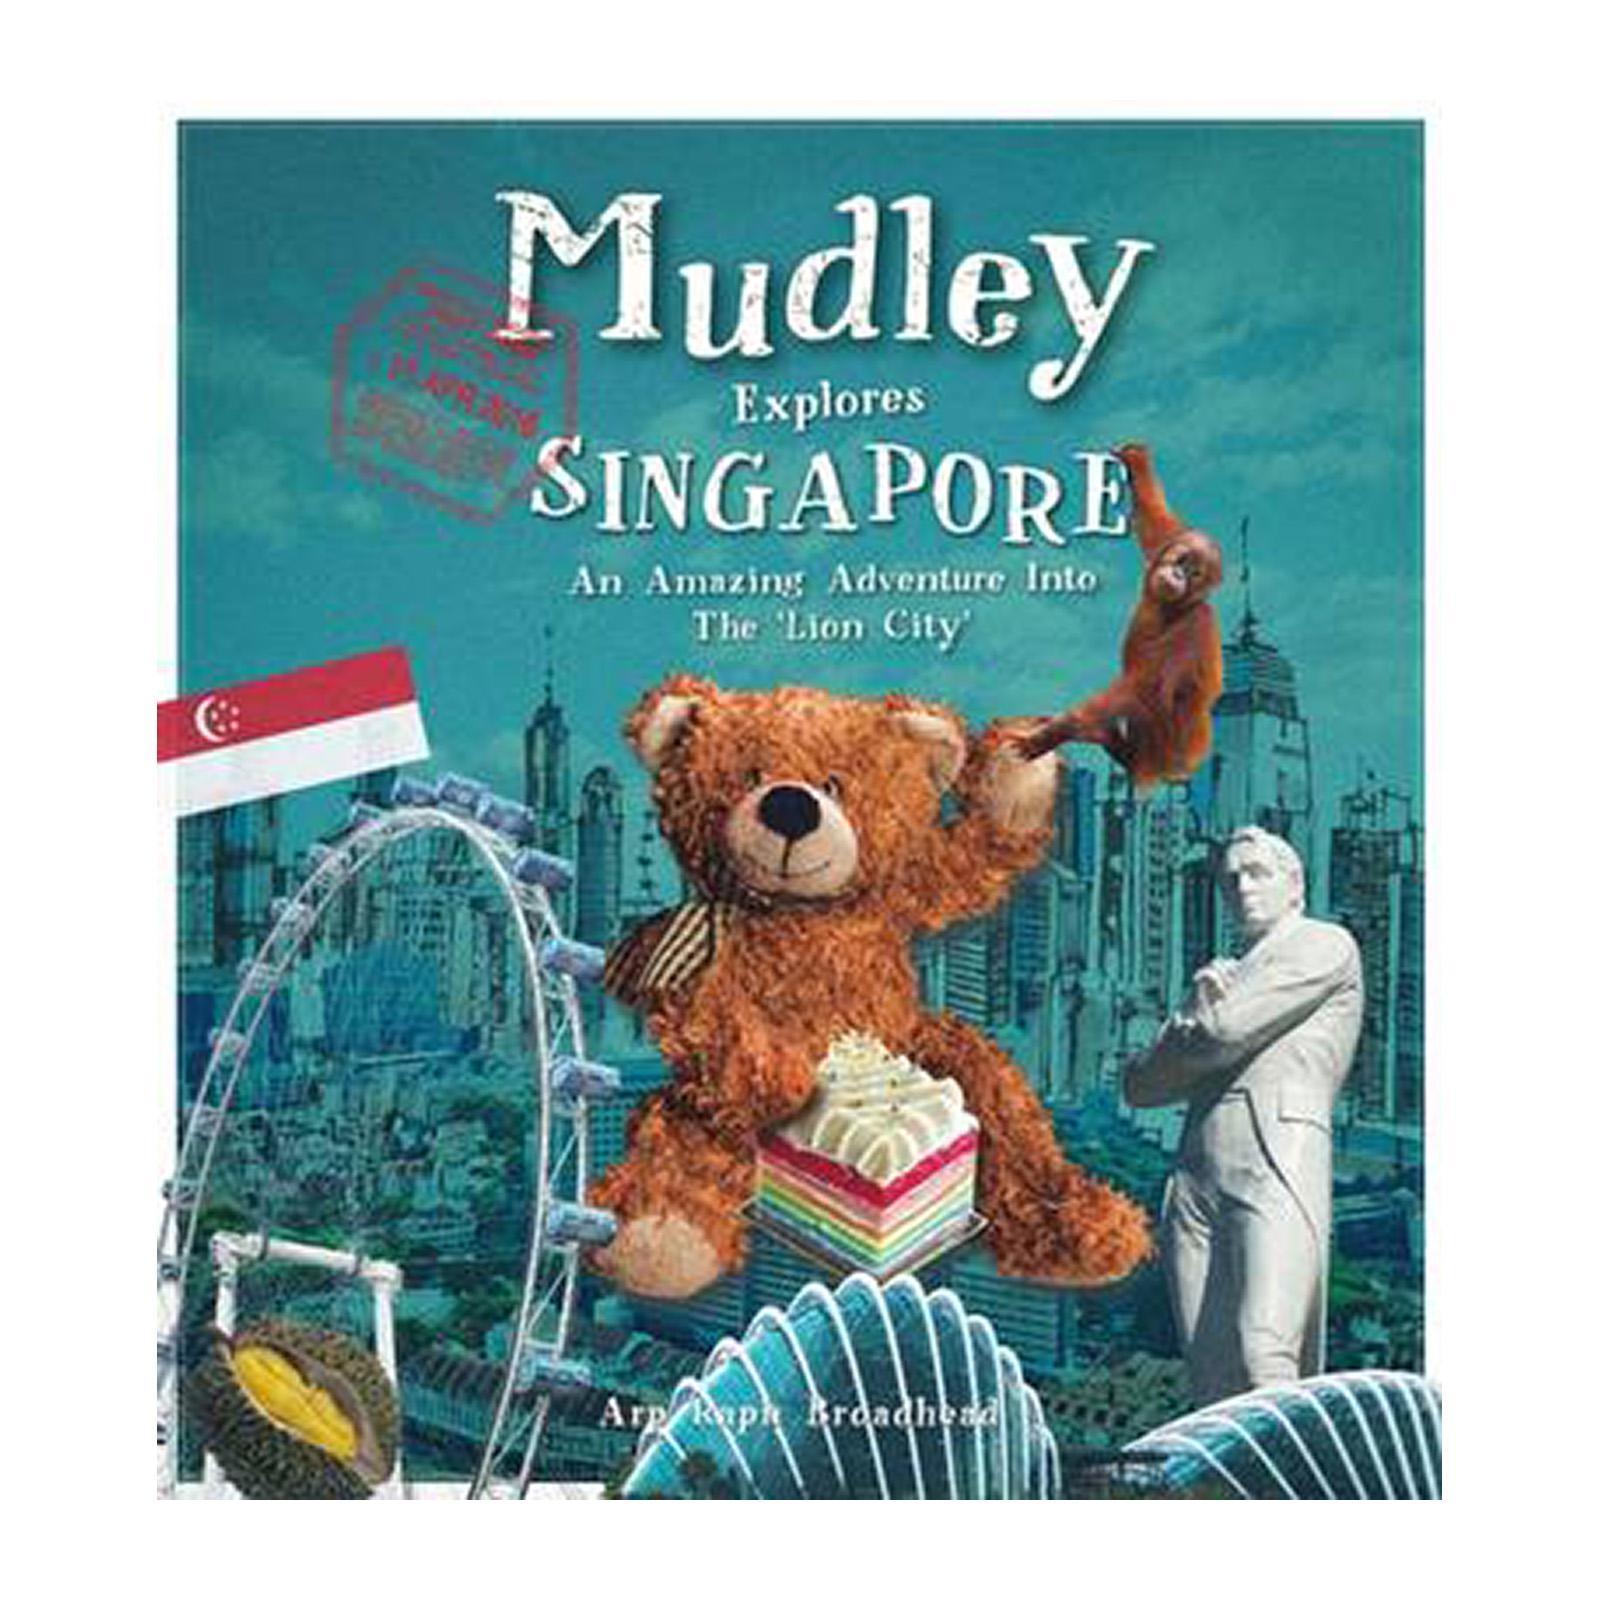 Mudley Explores Singapore: An Amazing Adventure Into The Lion City (Paperback)